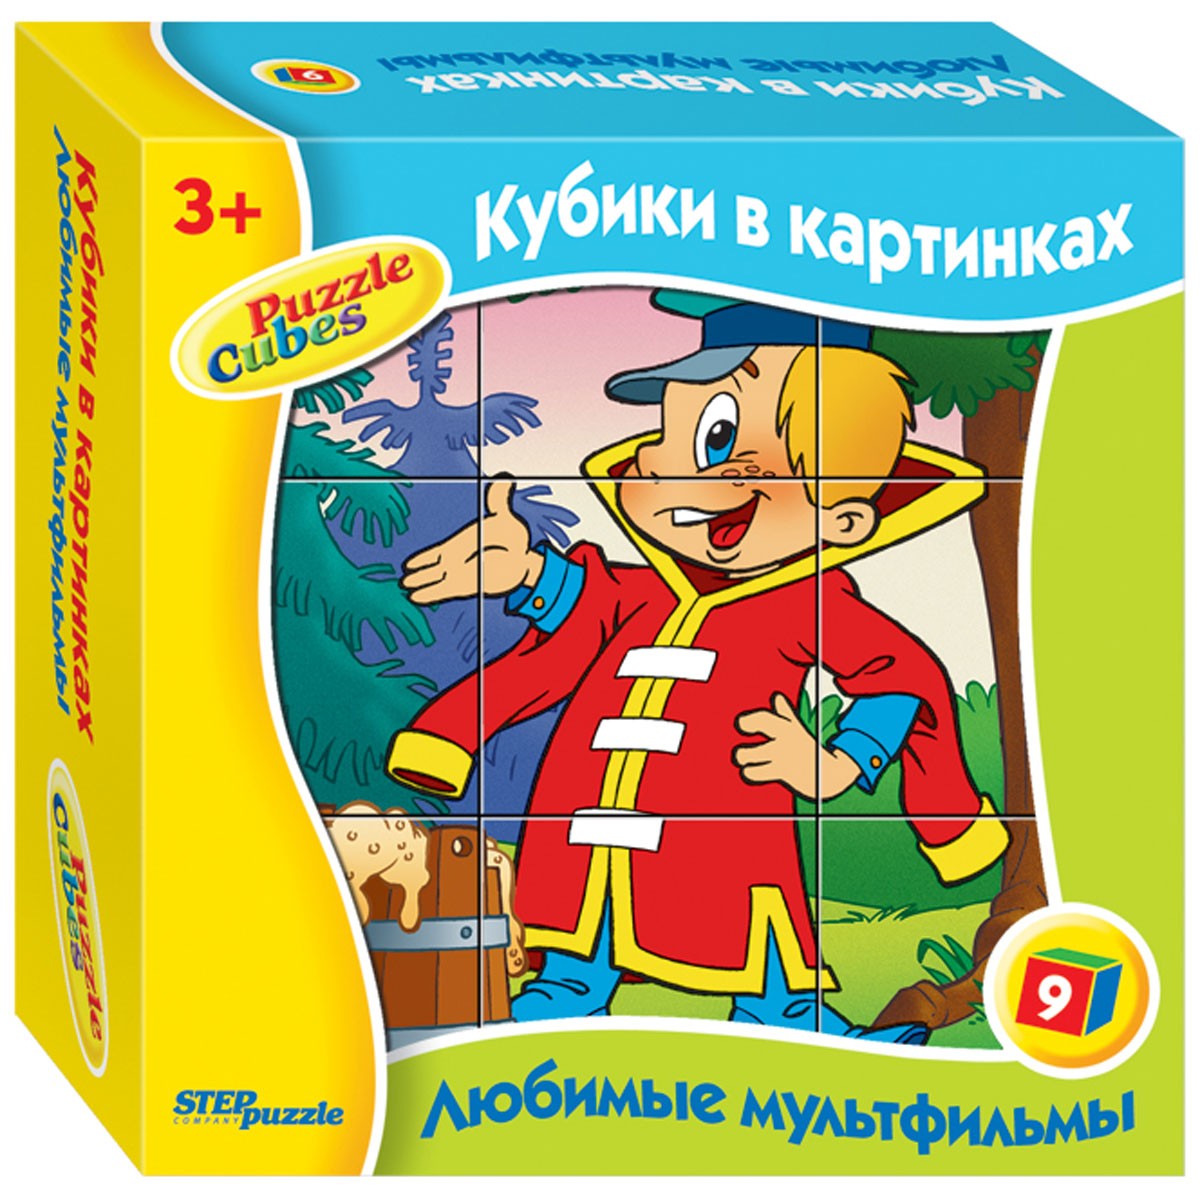 Step Puzzle Кубики Вовка в Тридевятом царстве step puzzle кубики вовка в тридевятом царстве